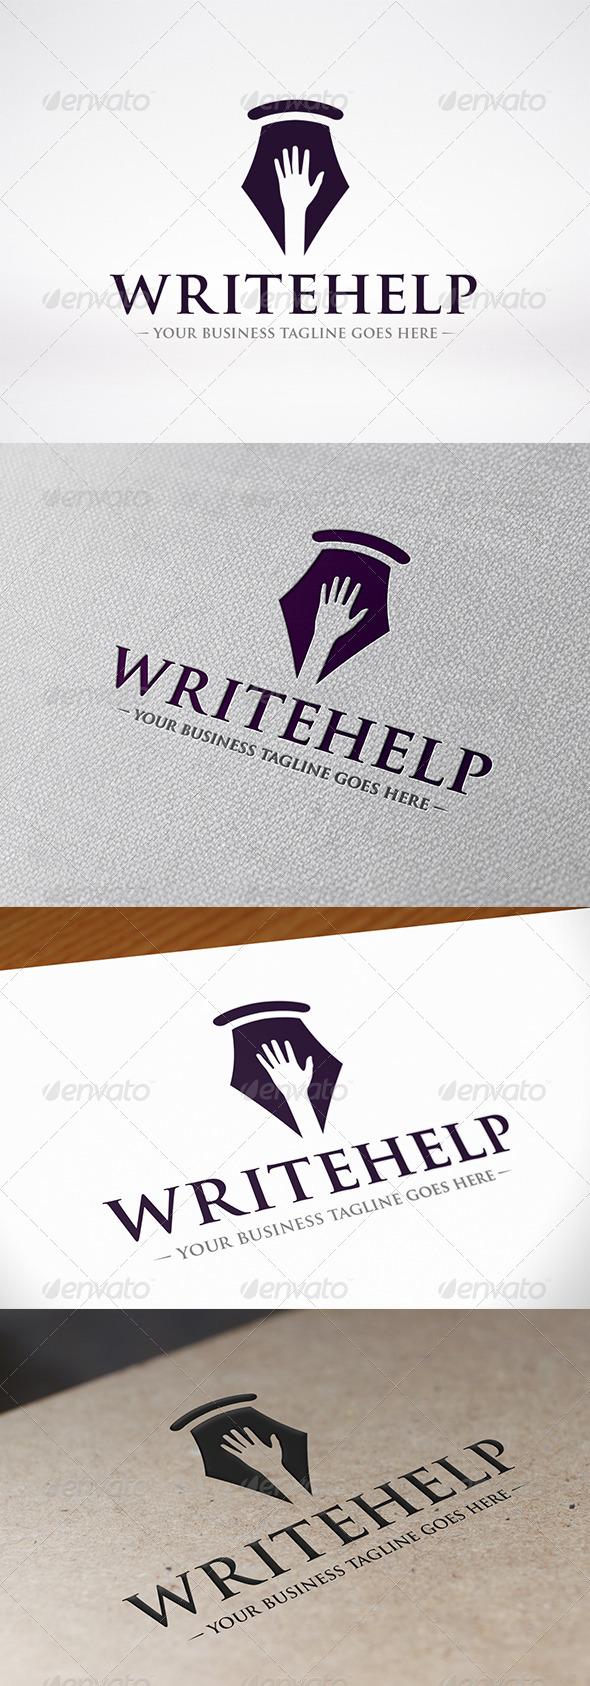 GraphicRiver Write Help Logo Template 7752495